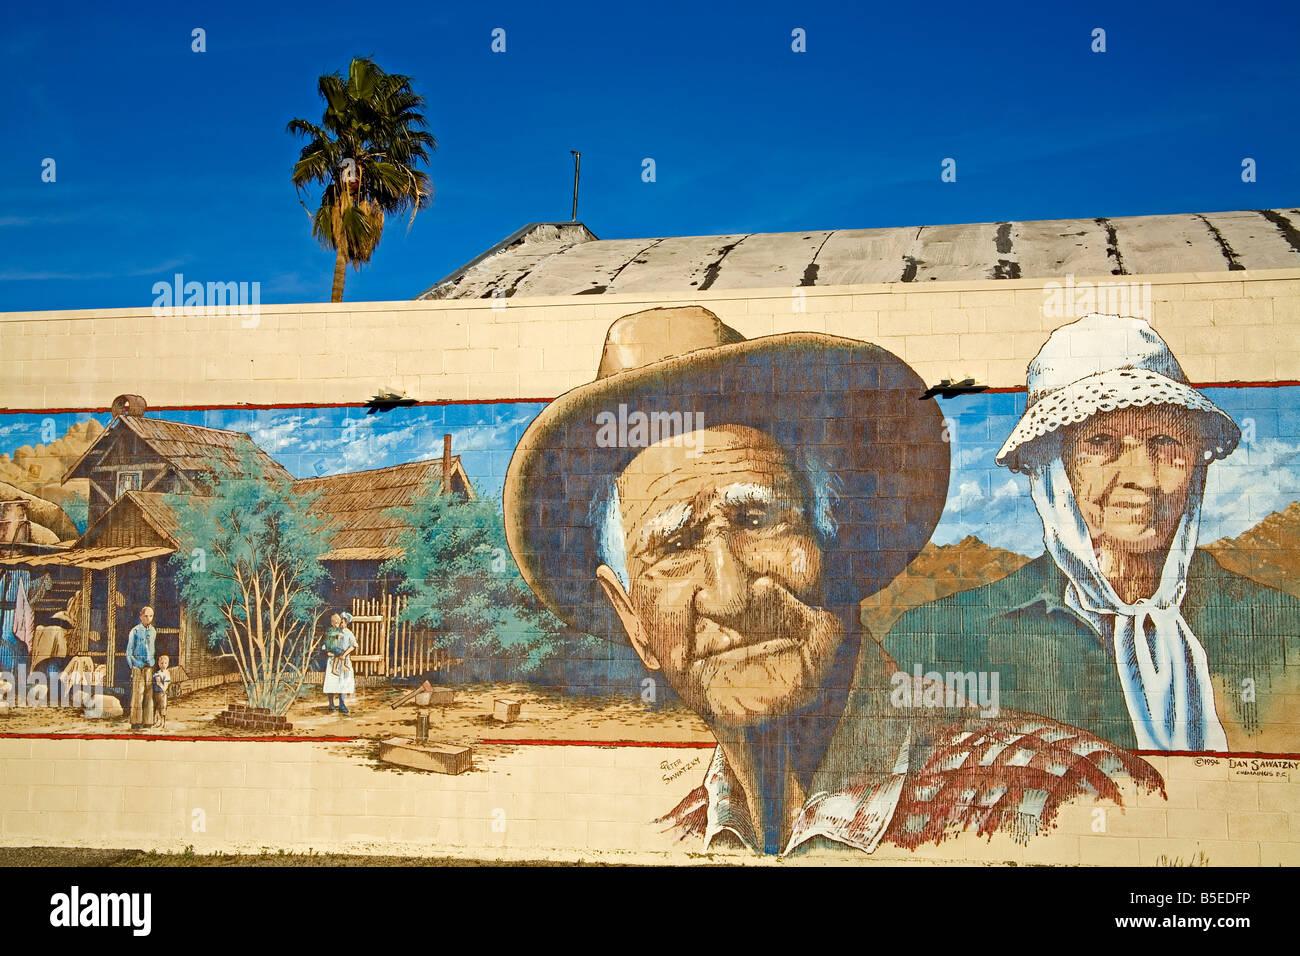 Wandbild von Peter und Dan Sawatzky, 29 Palms City, Kalifornien, USA, Nordamerika Stockbild